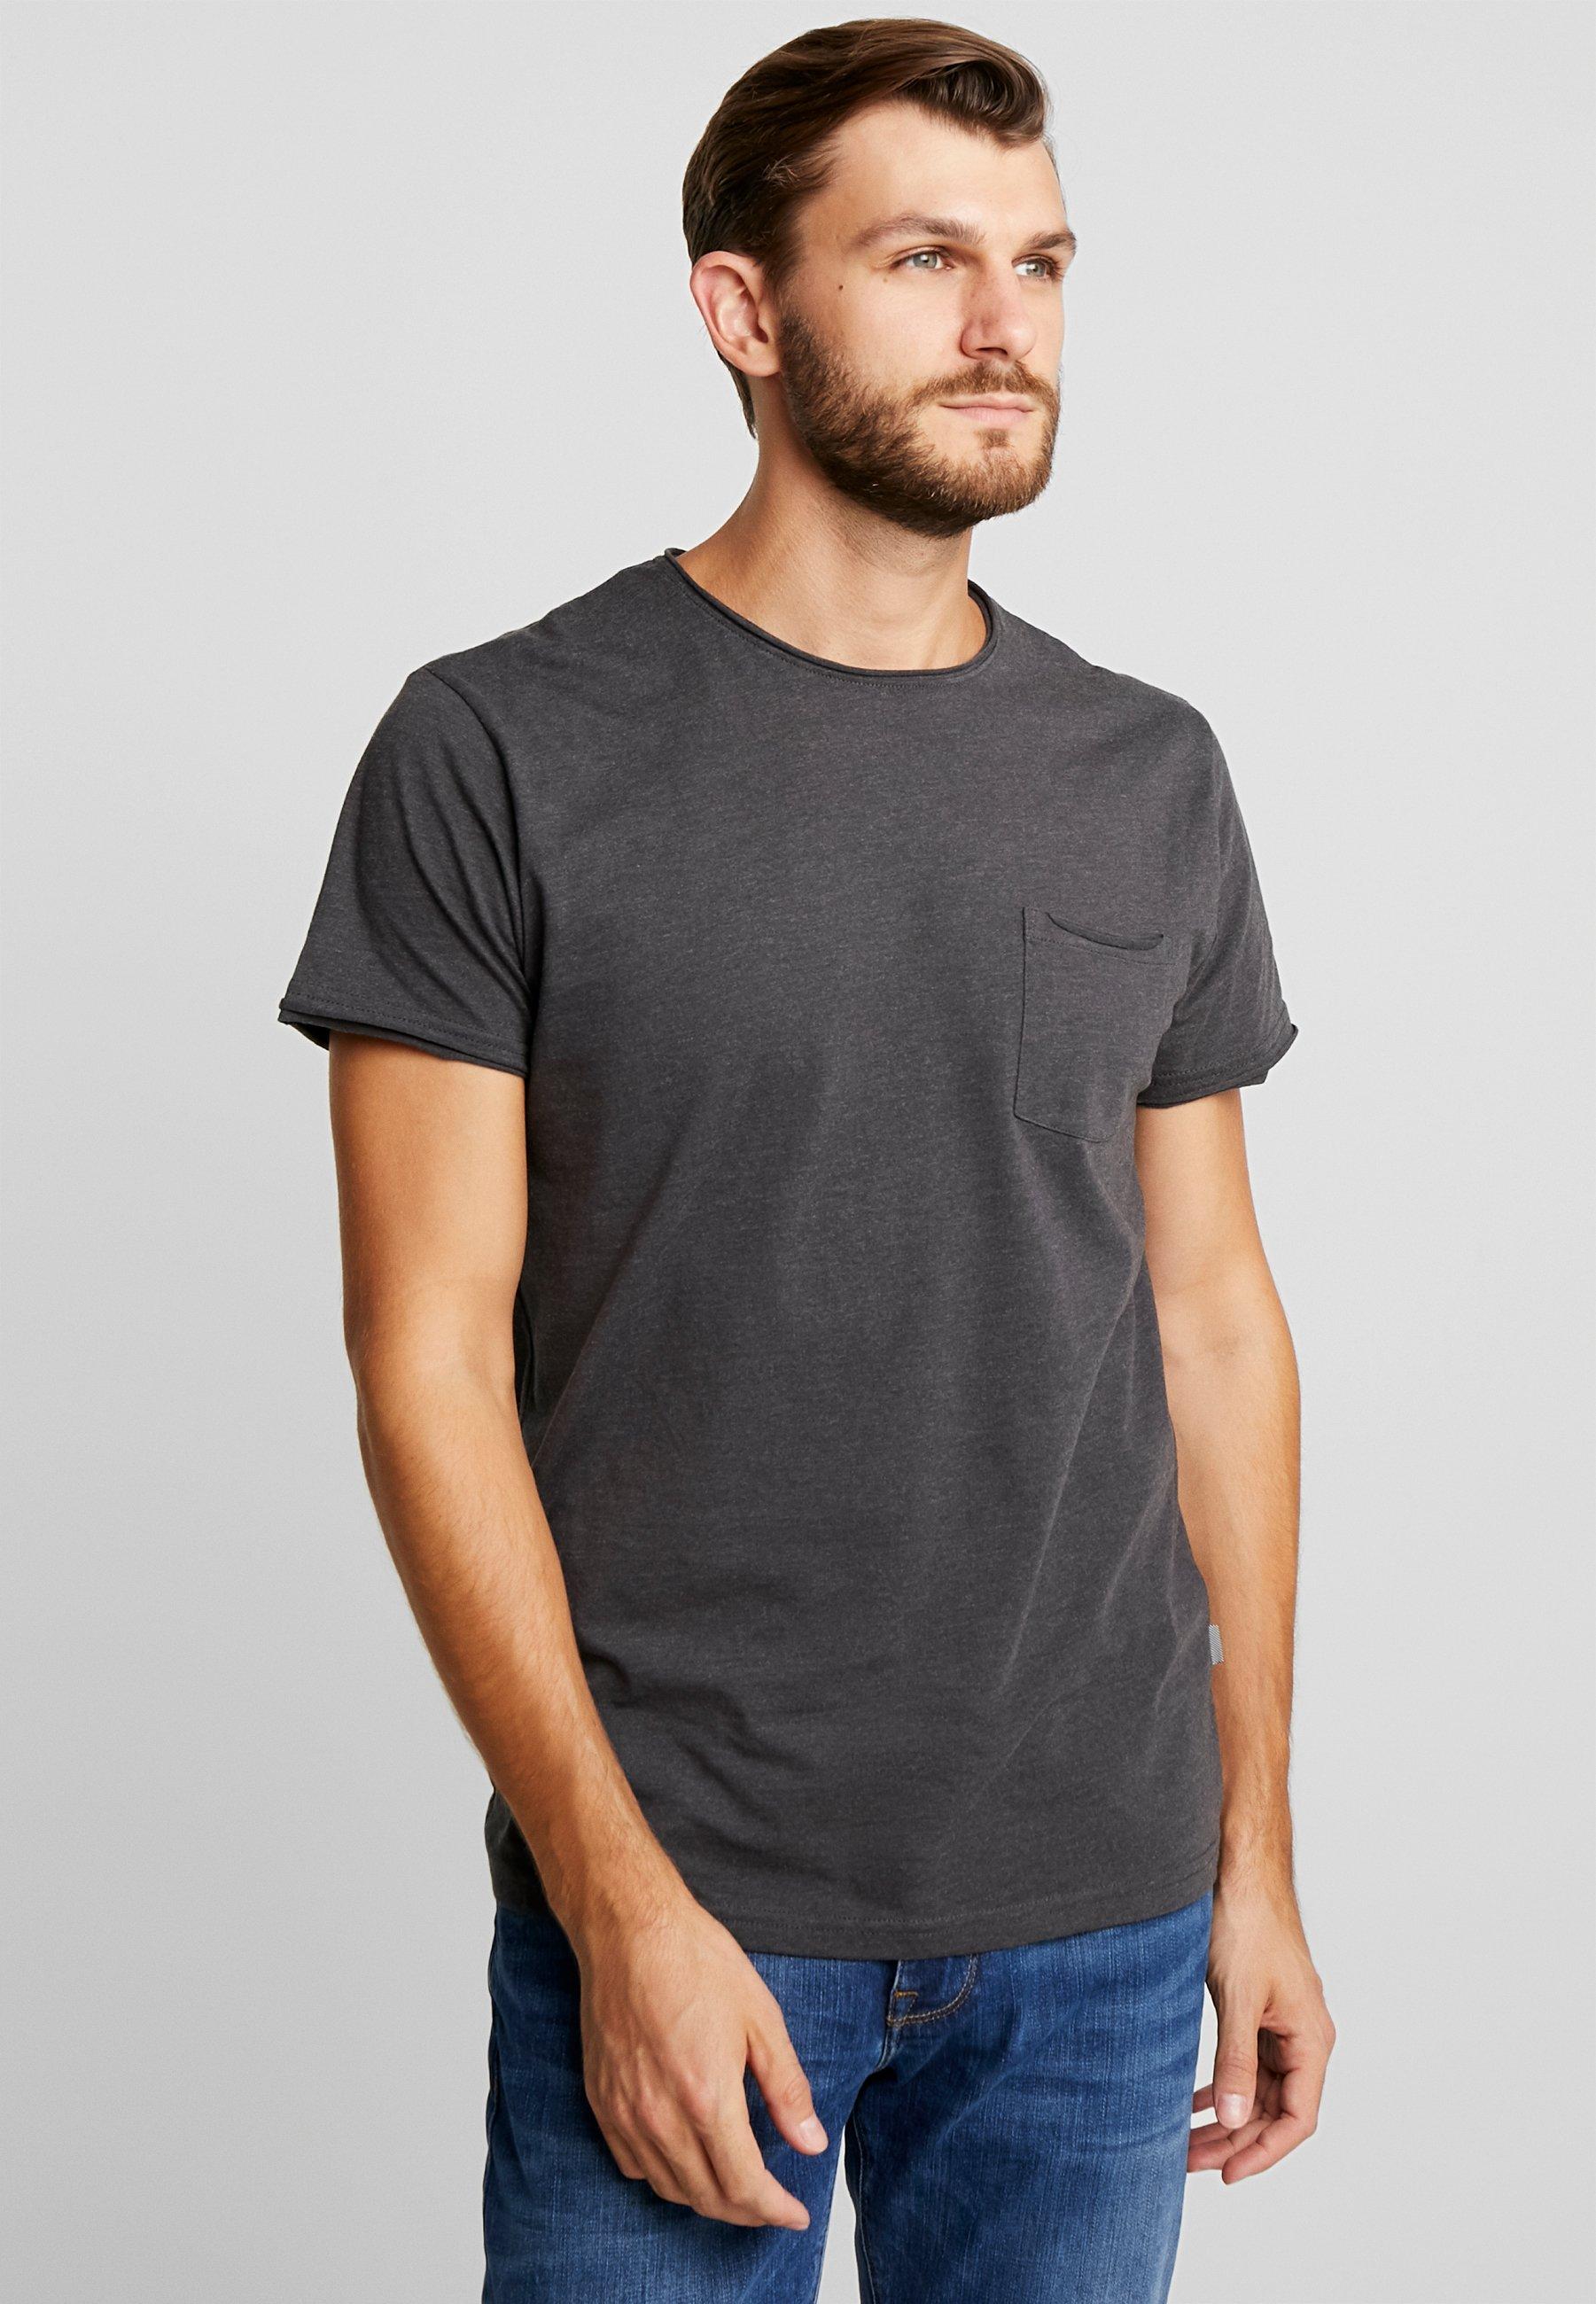 Uomo GAYLIN - T-shirt basic - dar grey